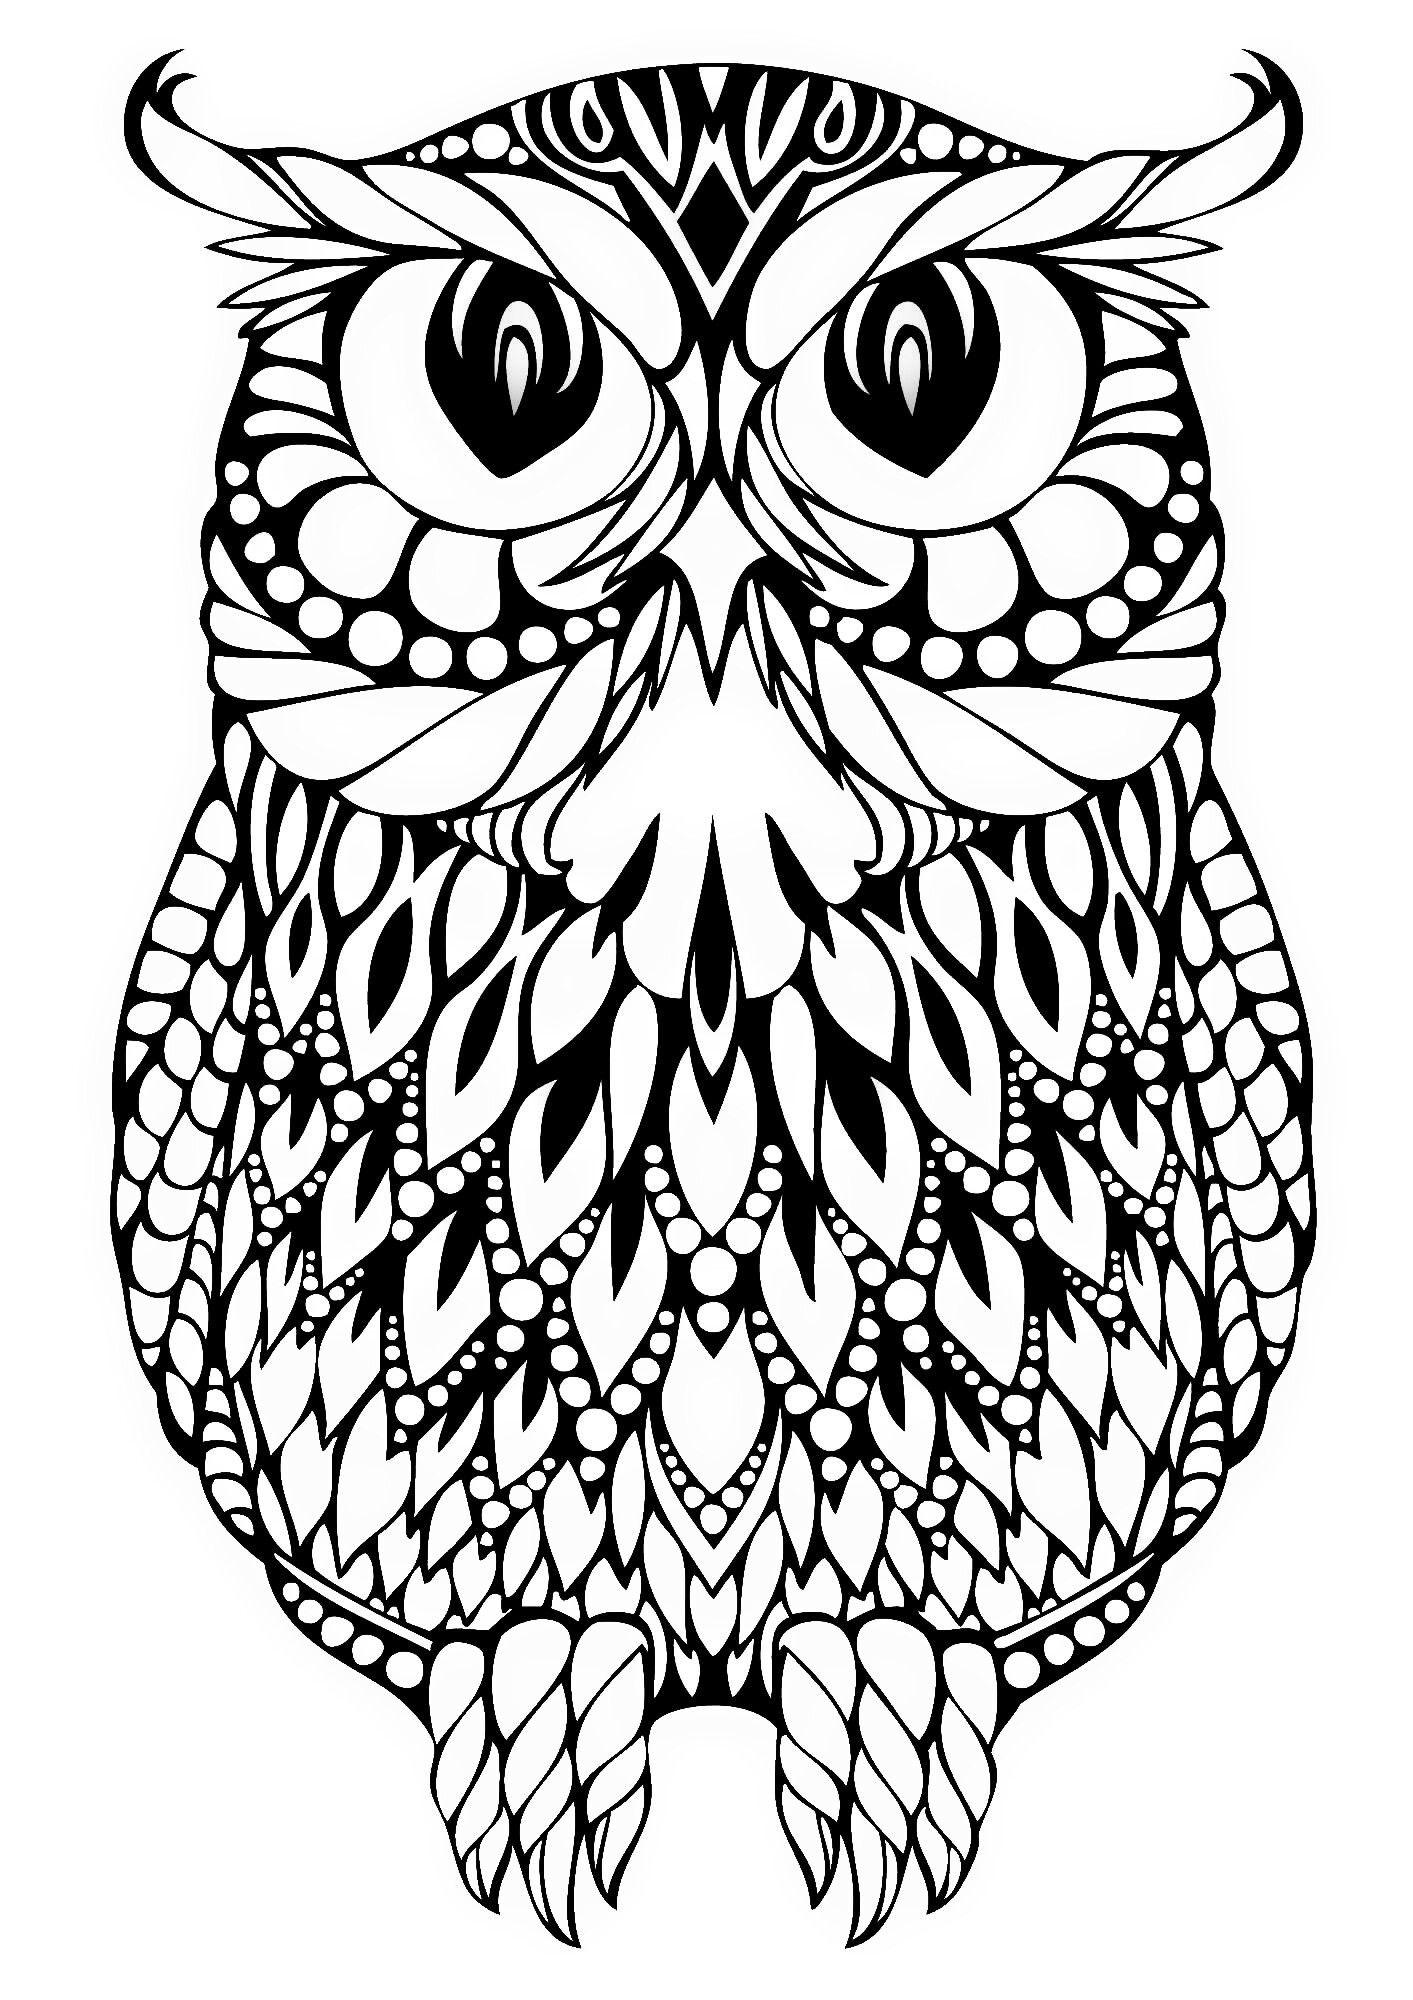 Pin von yvonne huang huang auf good ideal Patterns   Pinterest ...